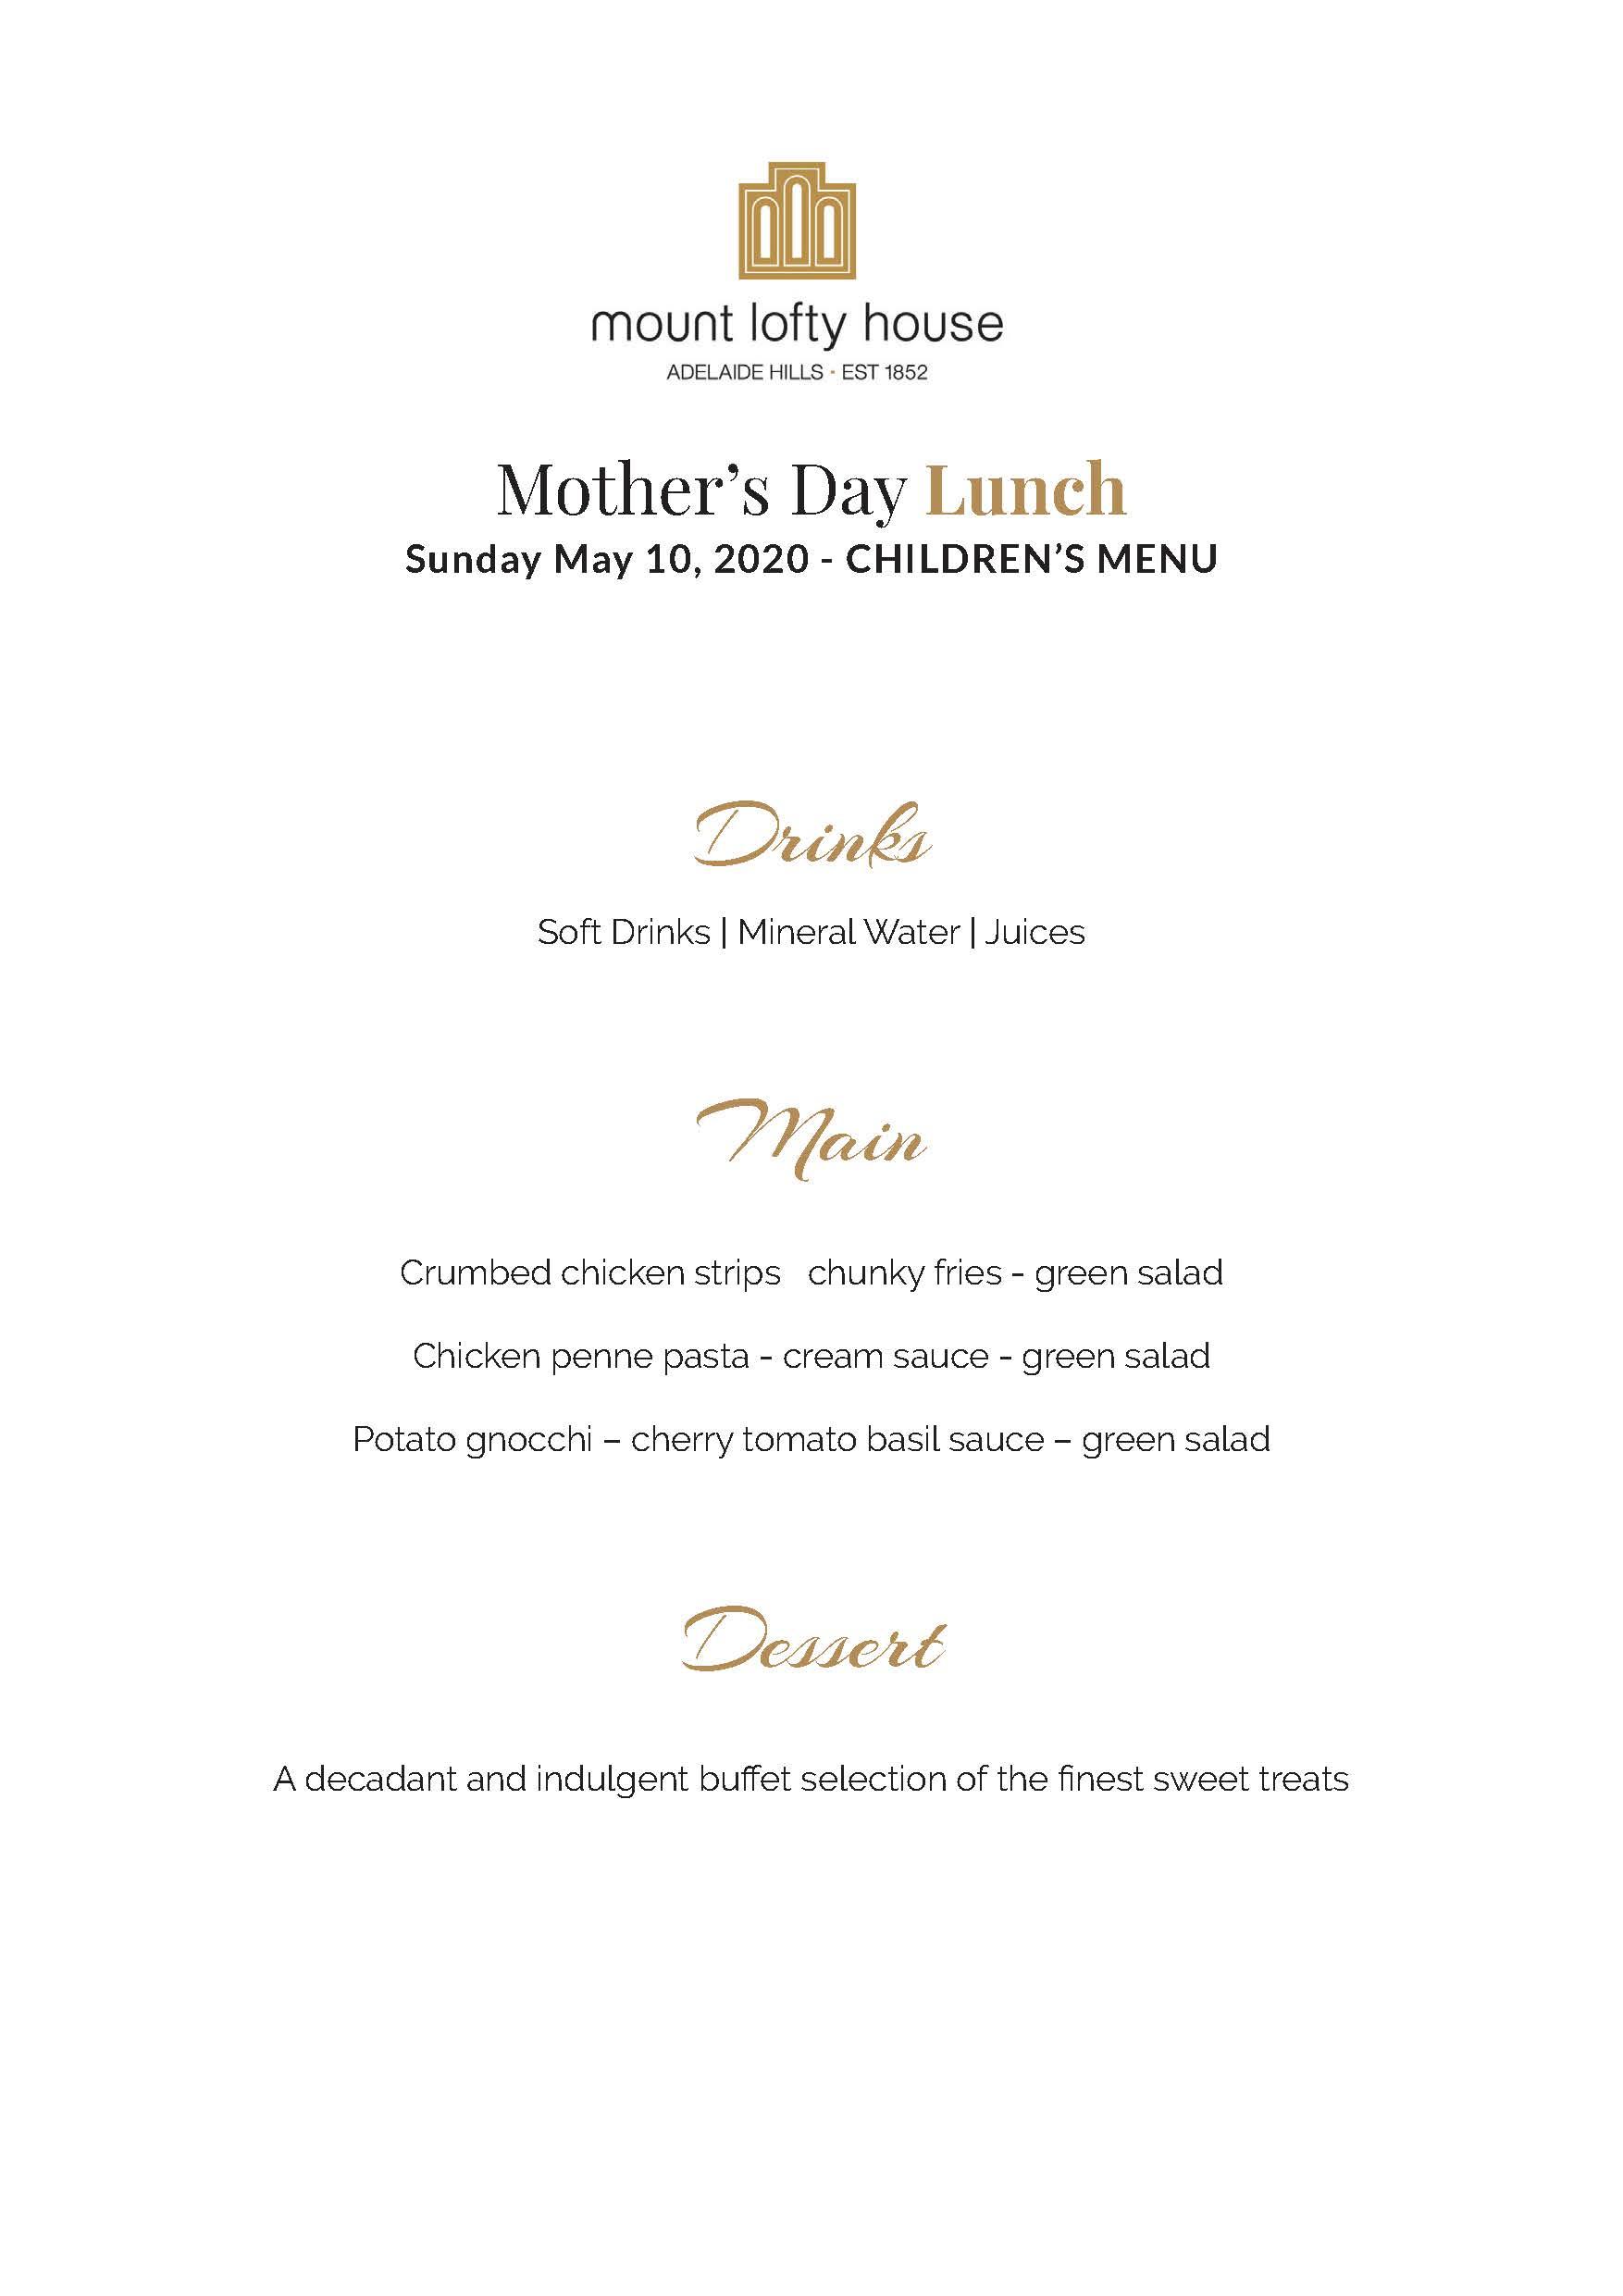 Mount Lofty House Mother's Day Children's Menu 2020